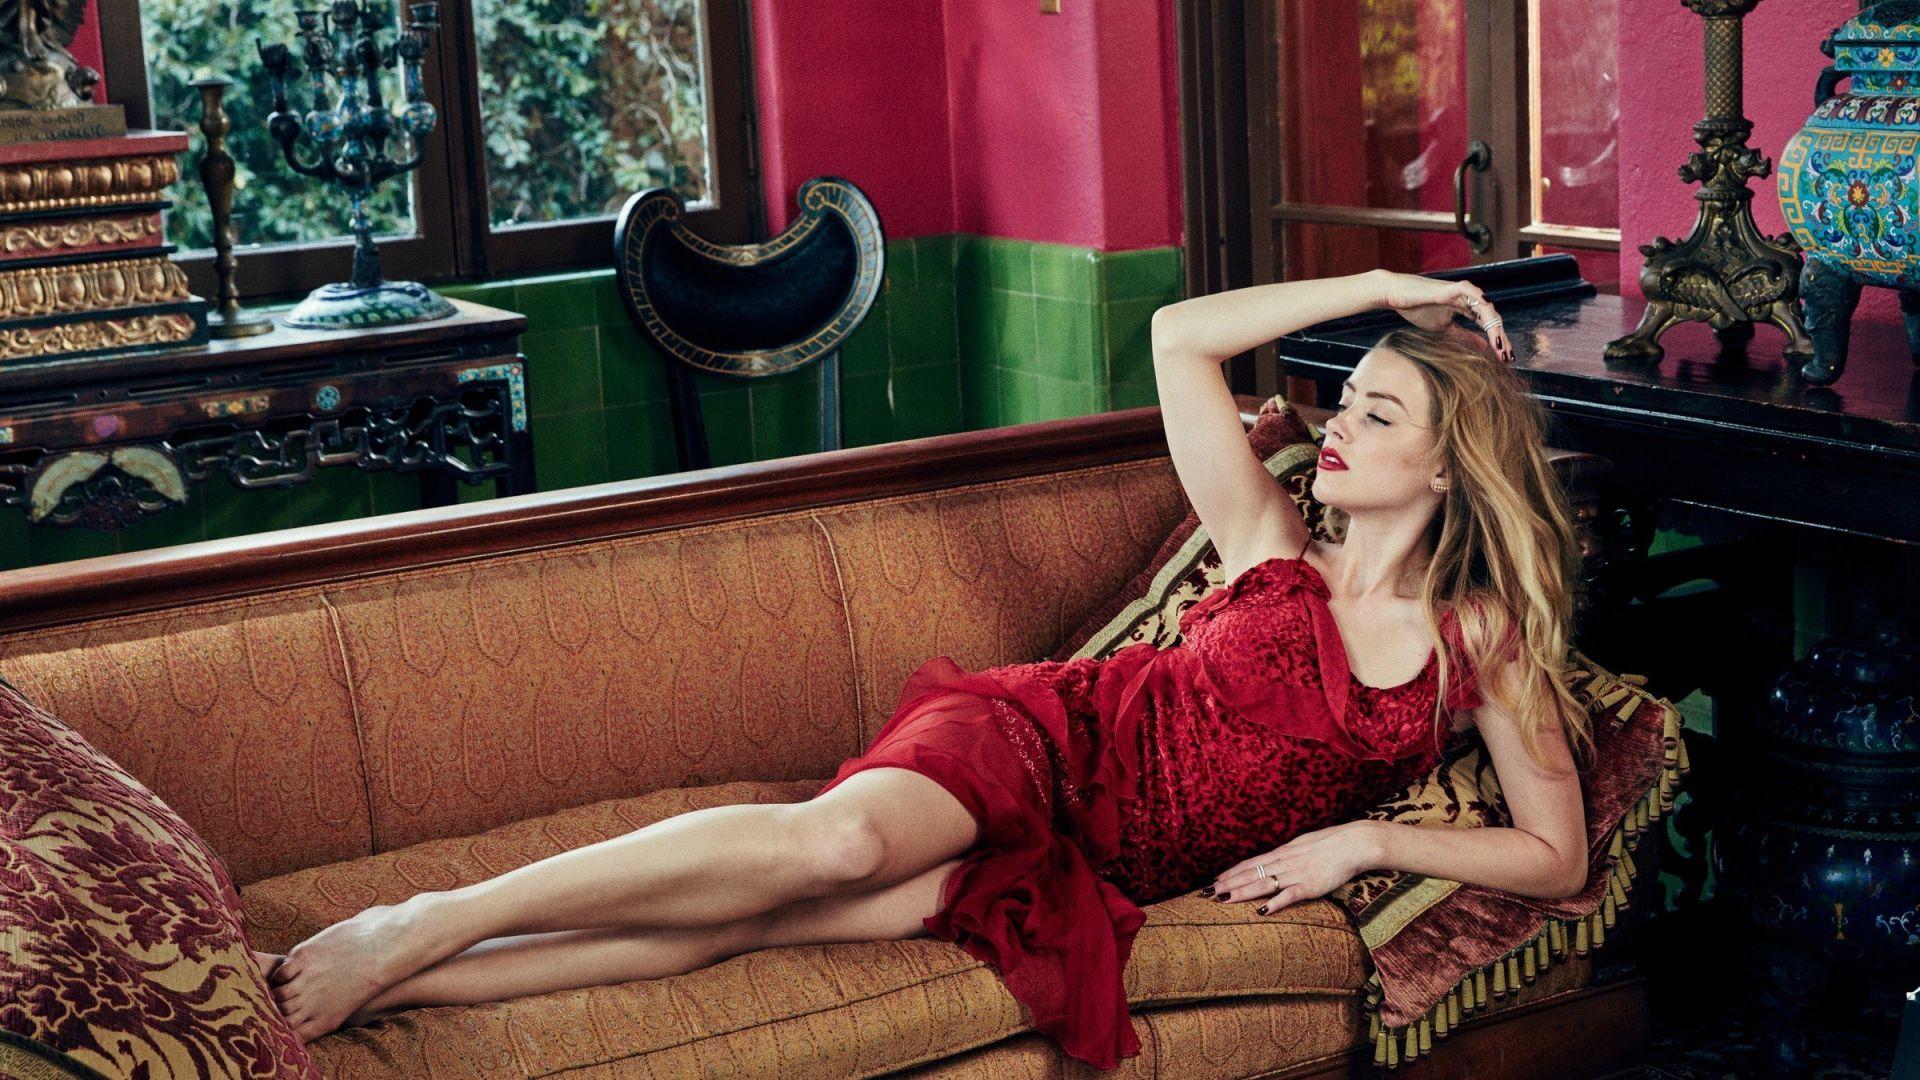 Desktop Wallpaper Amber Heard In Red Dress Sofa Hd Image